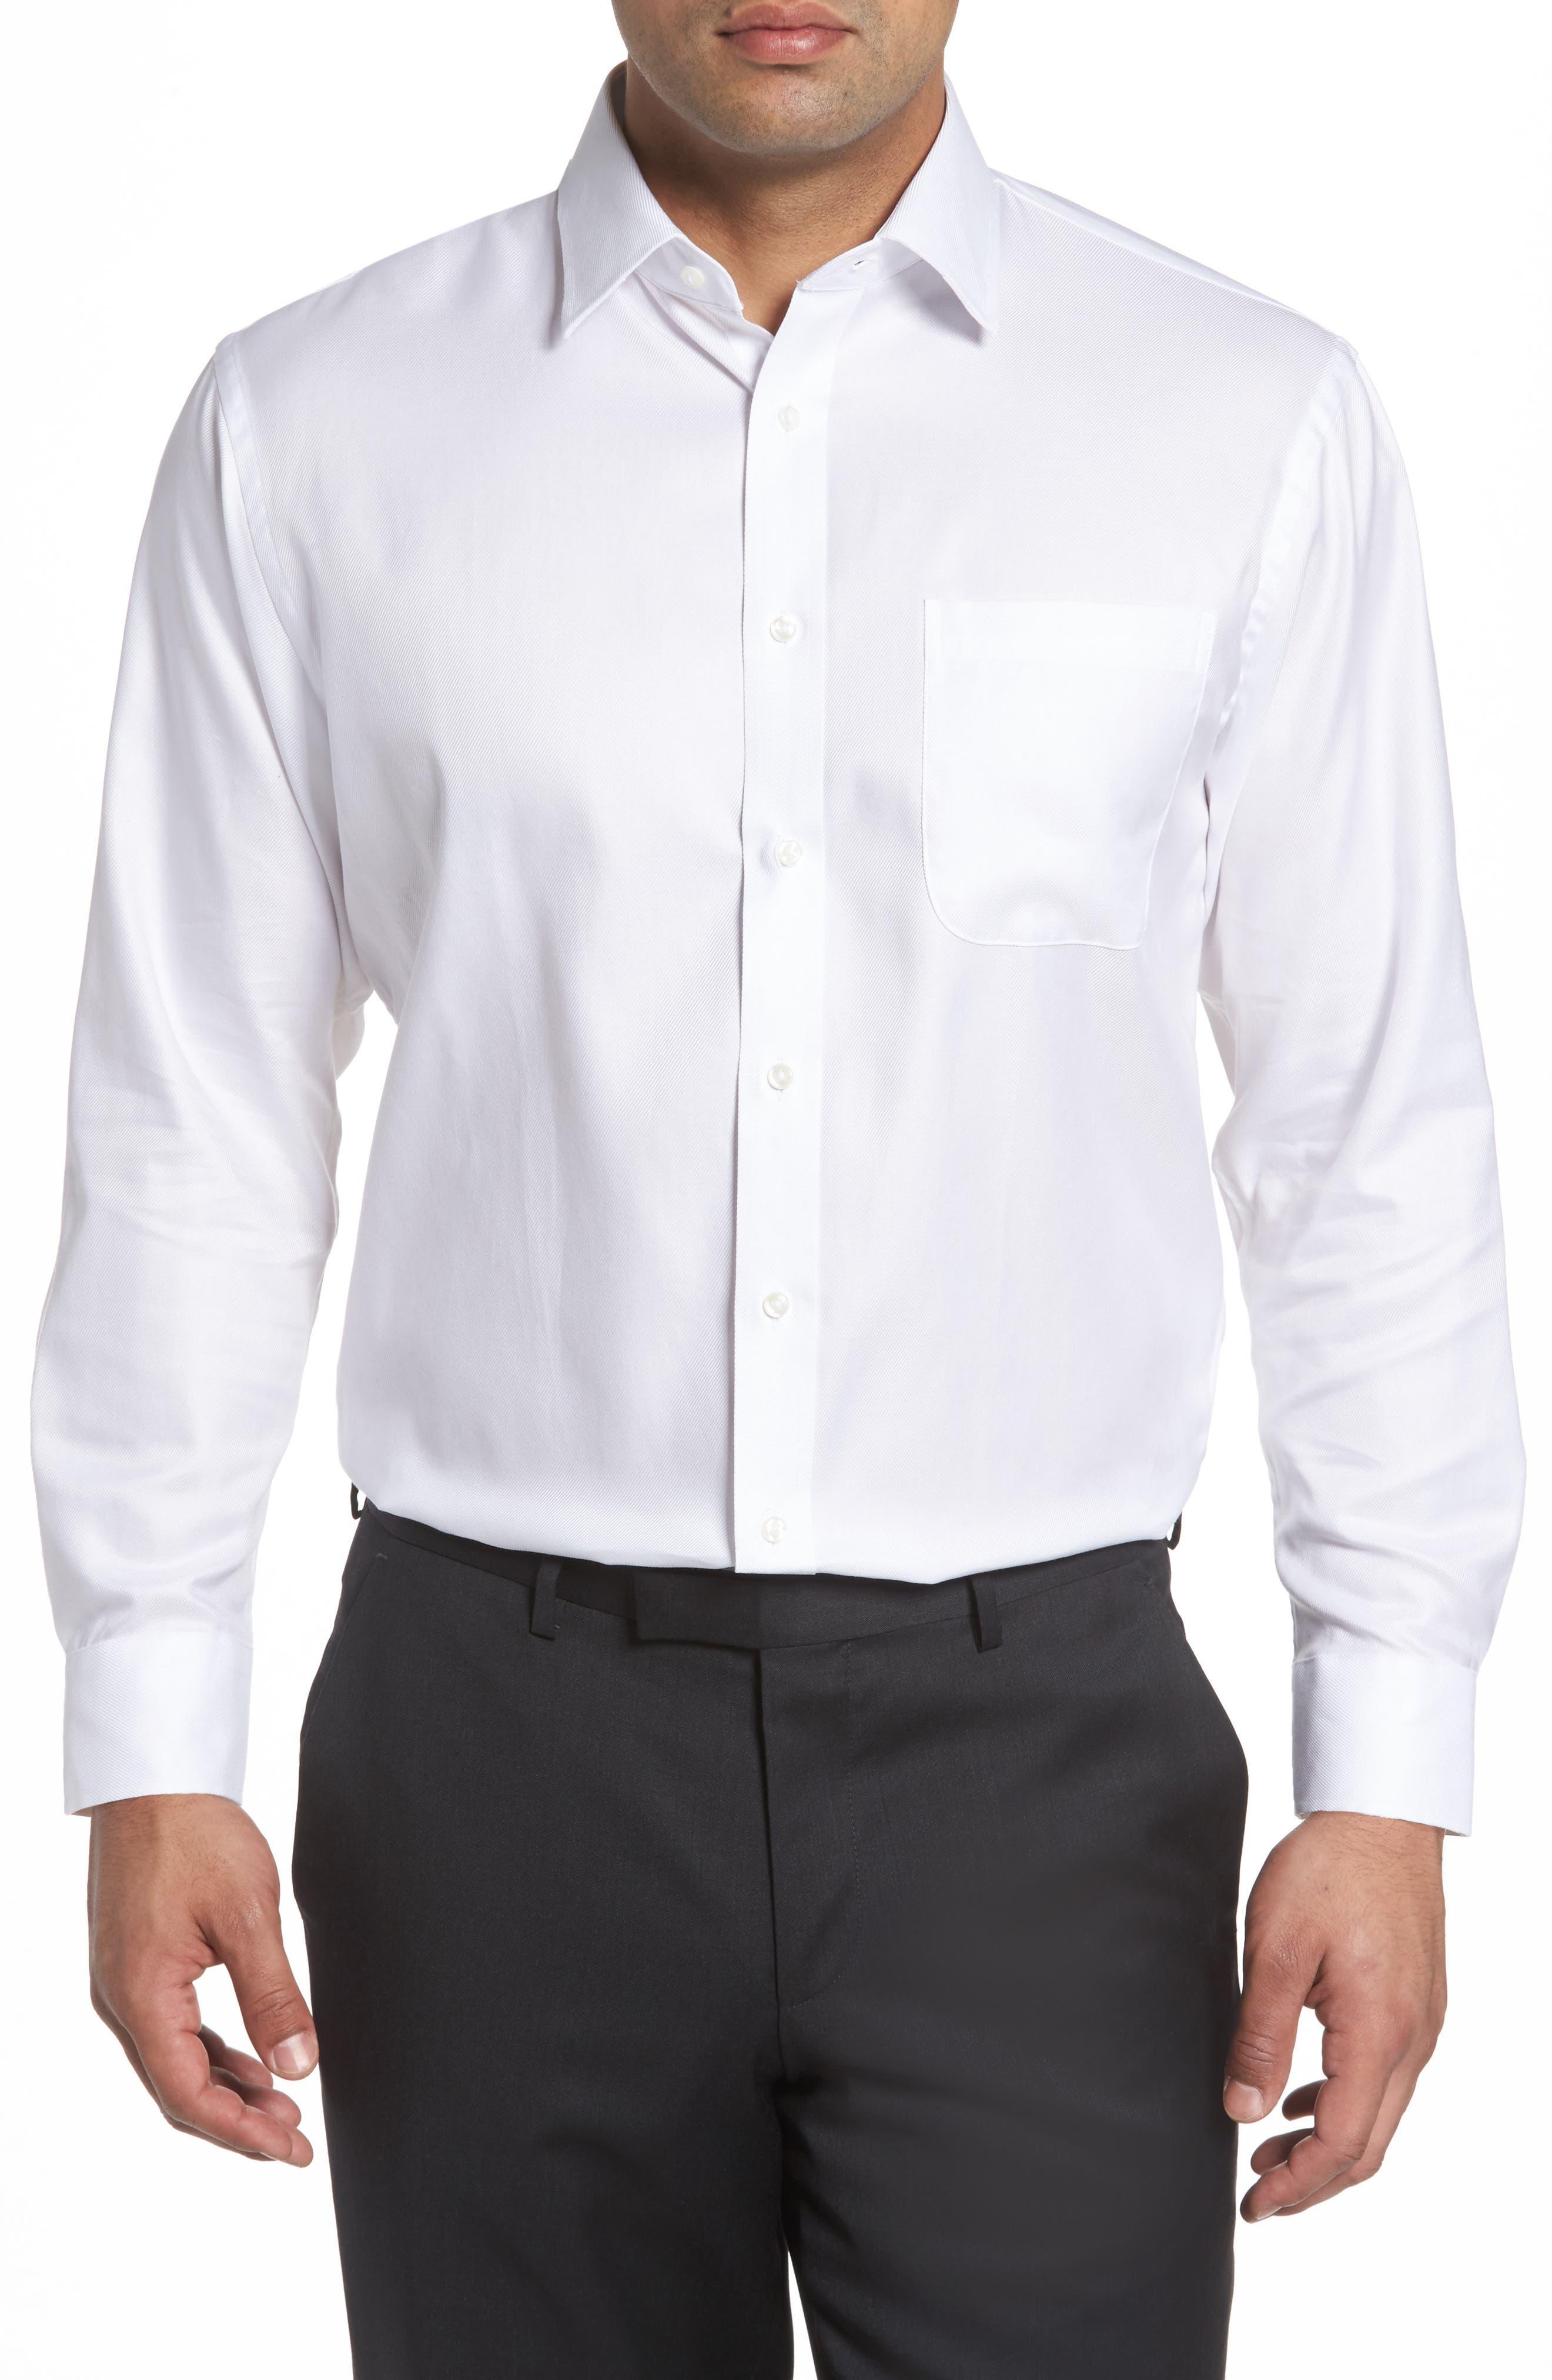 Main Image - Nordstrom Men's Shop Traditional Fit Solid Dress Shirt